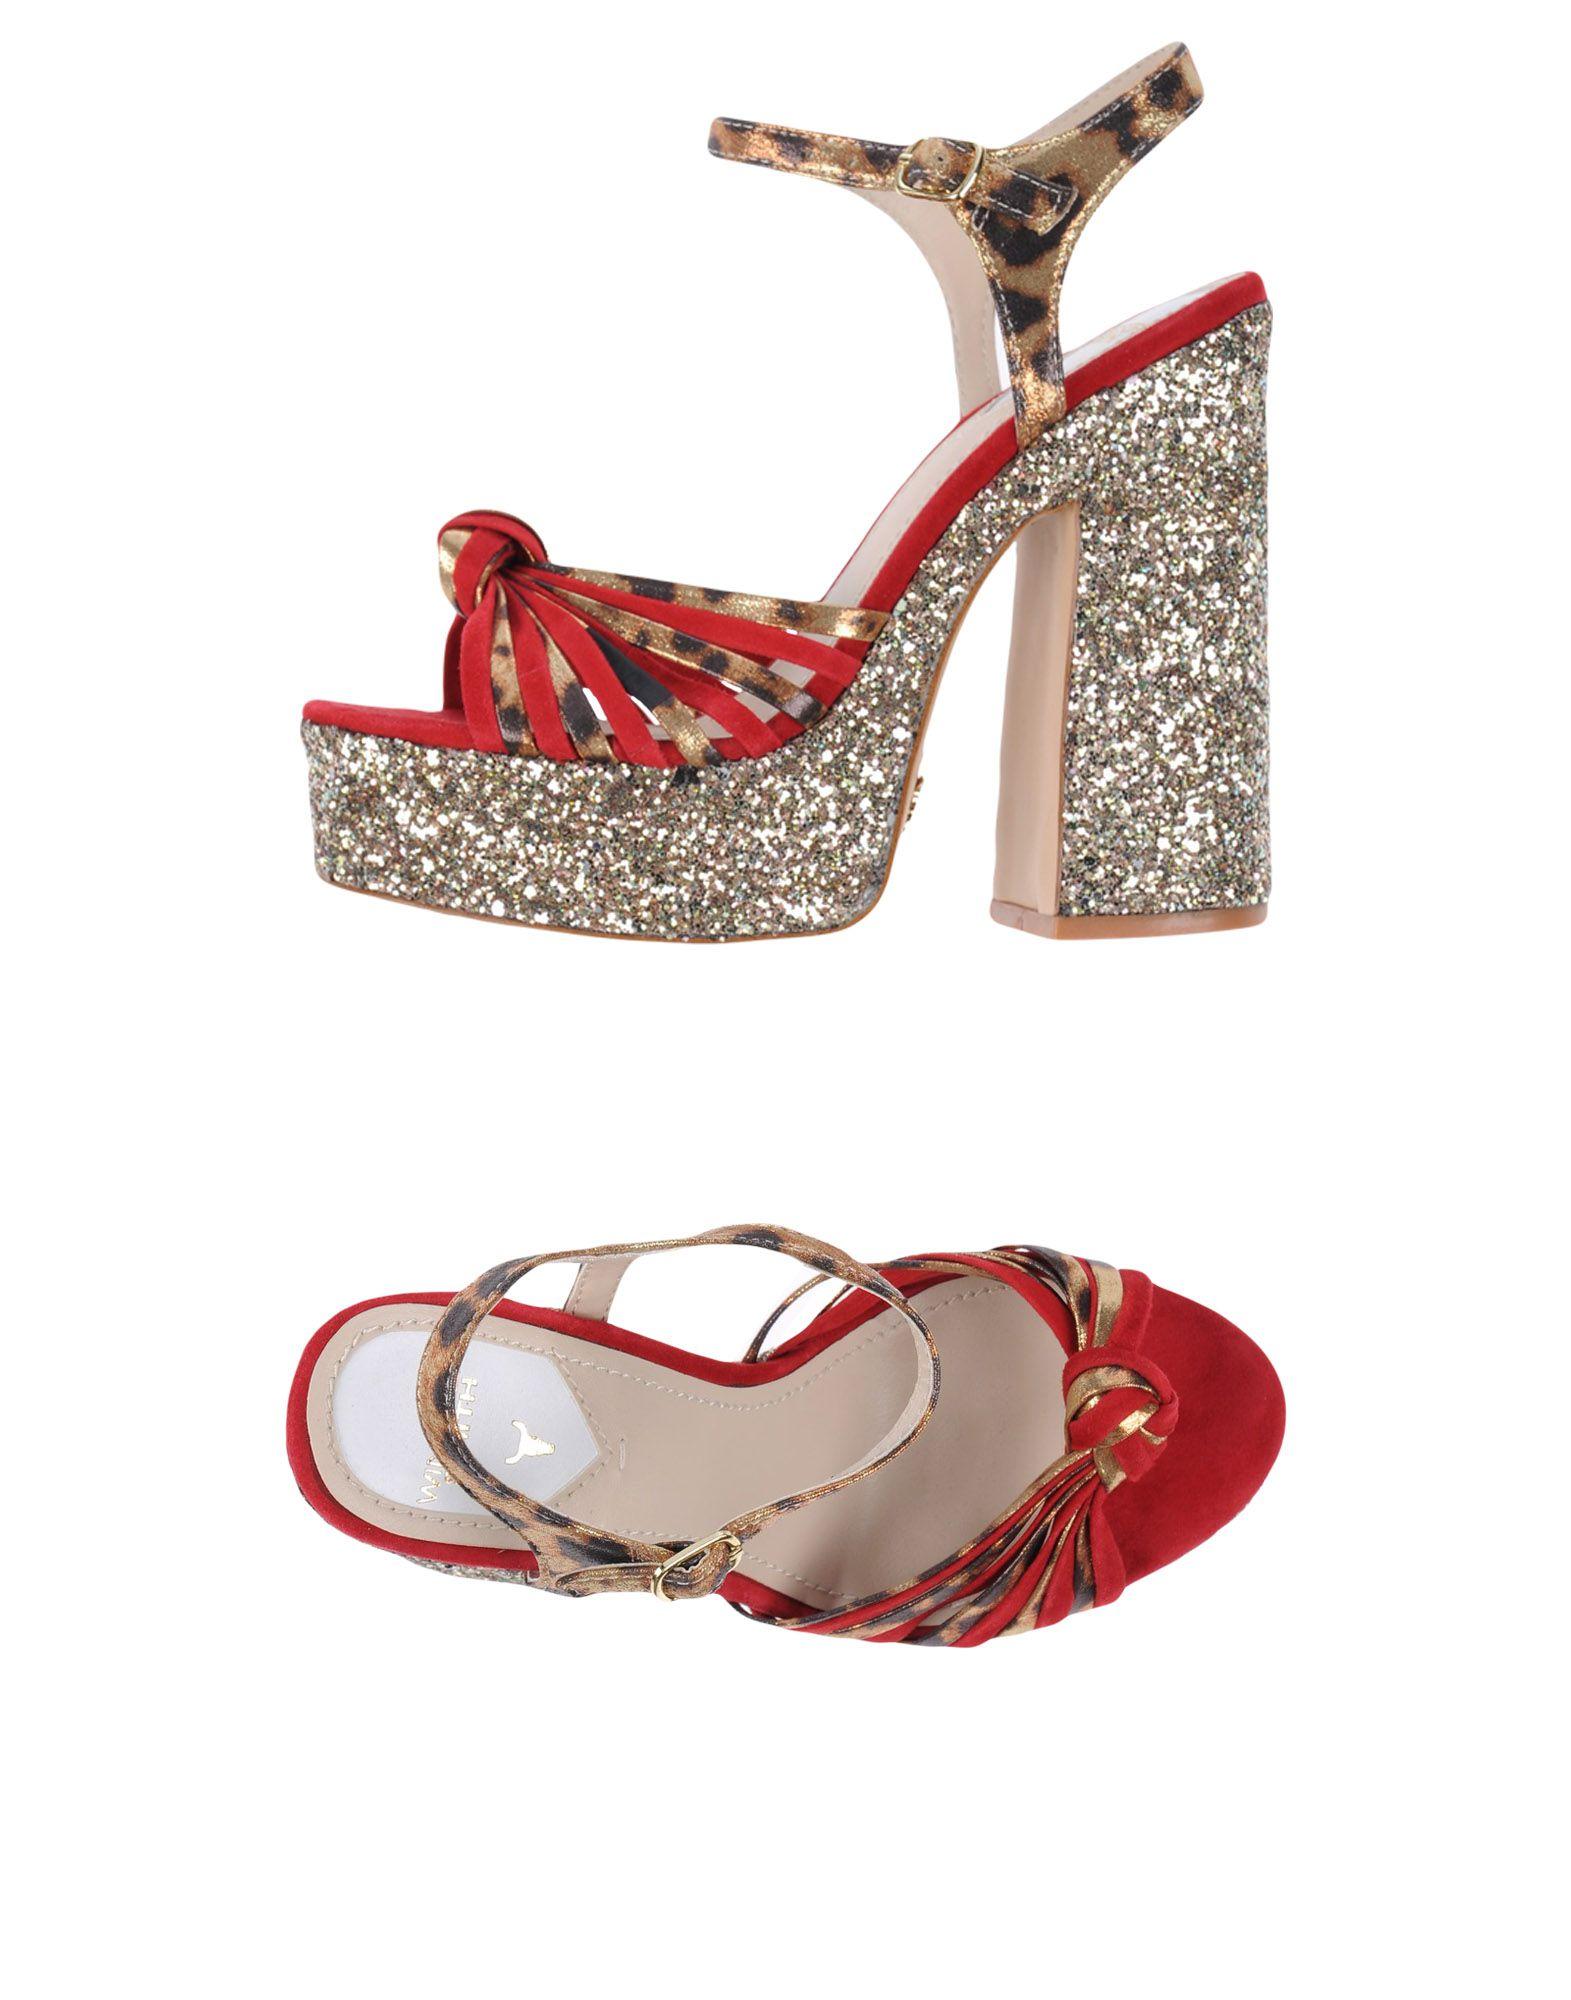 windsor smith female windsor smith sandals